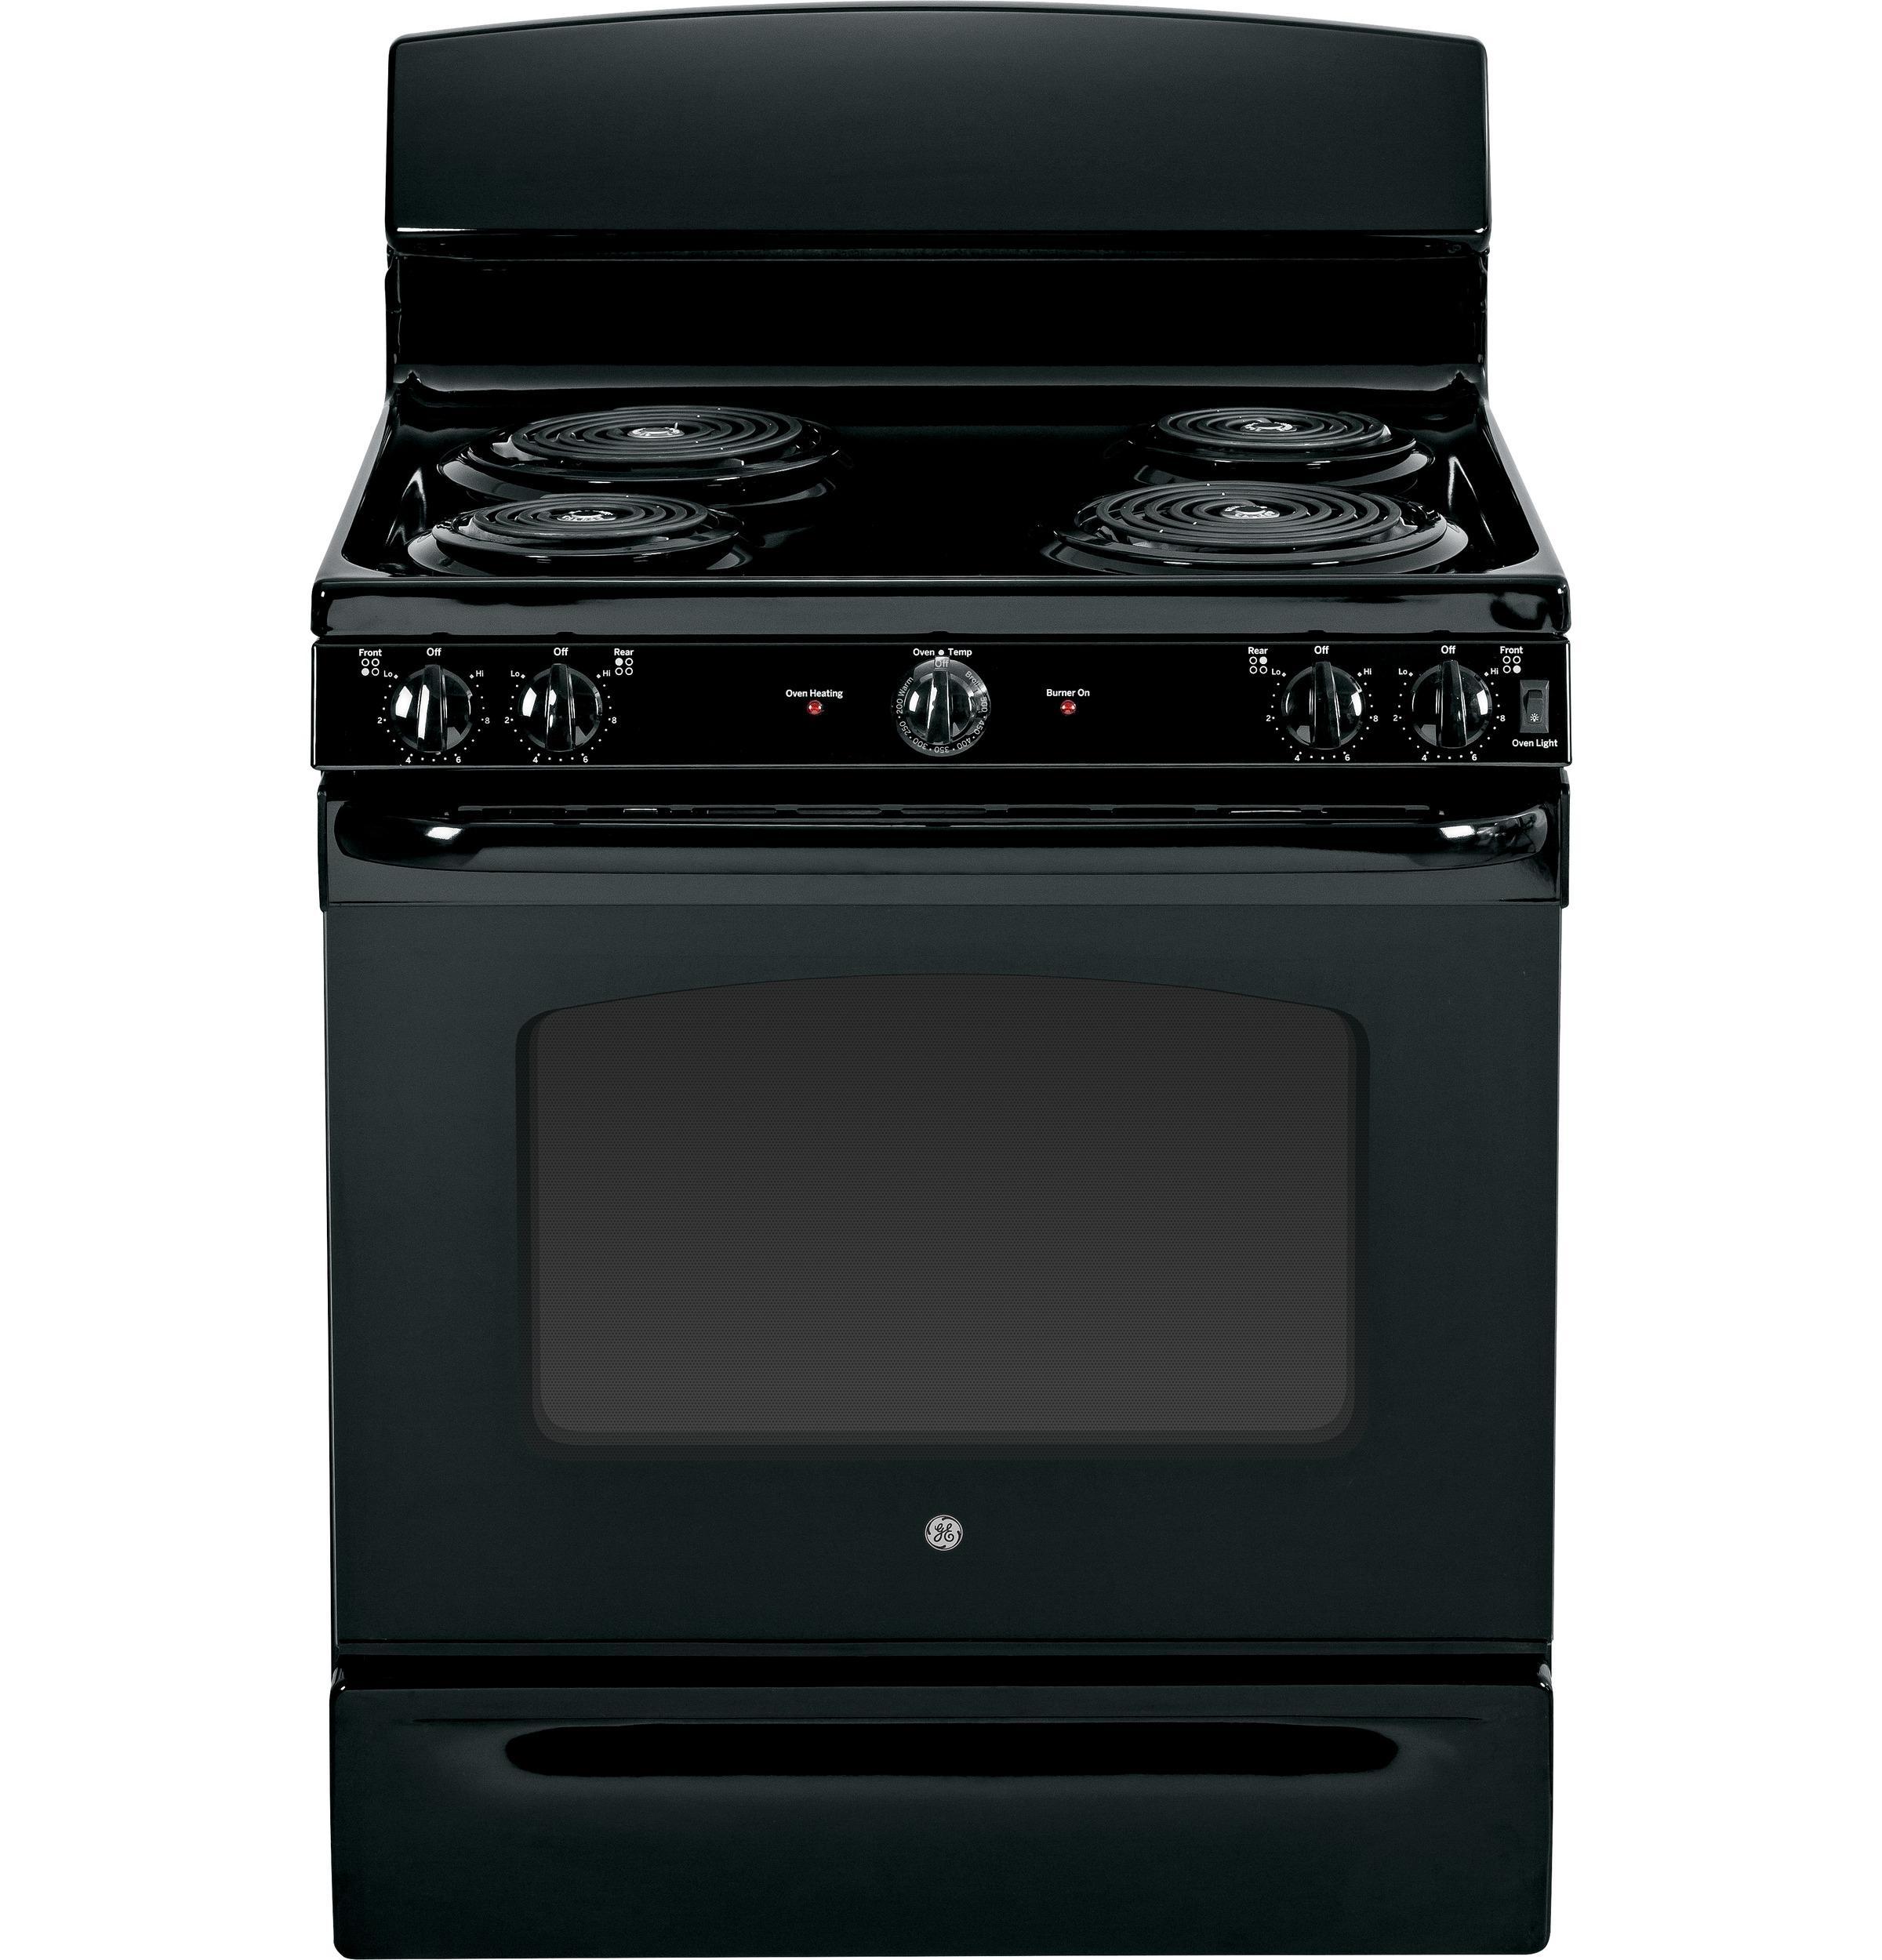 "GE Appliances Electric Range 30"" Free-Standing Electric Range - Item Number: JBS45DFBB"